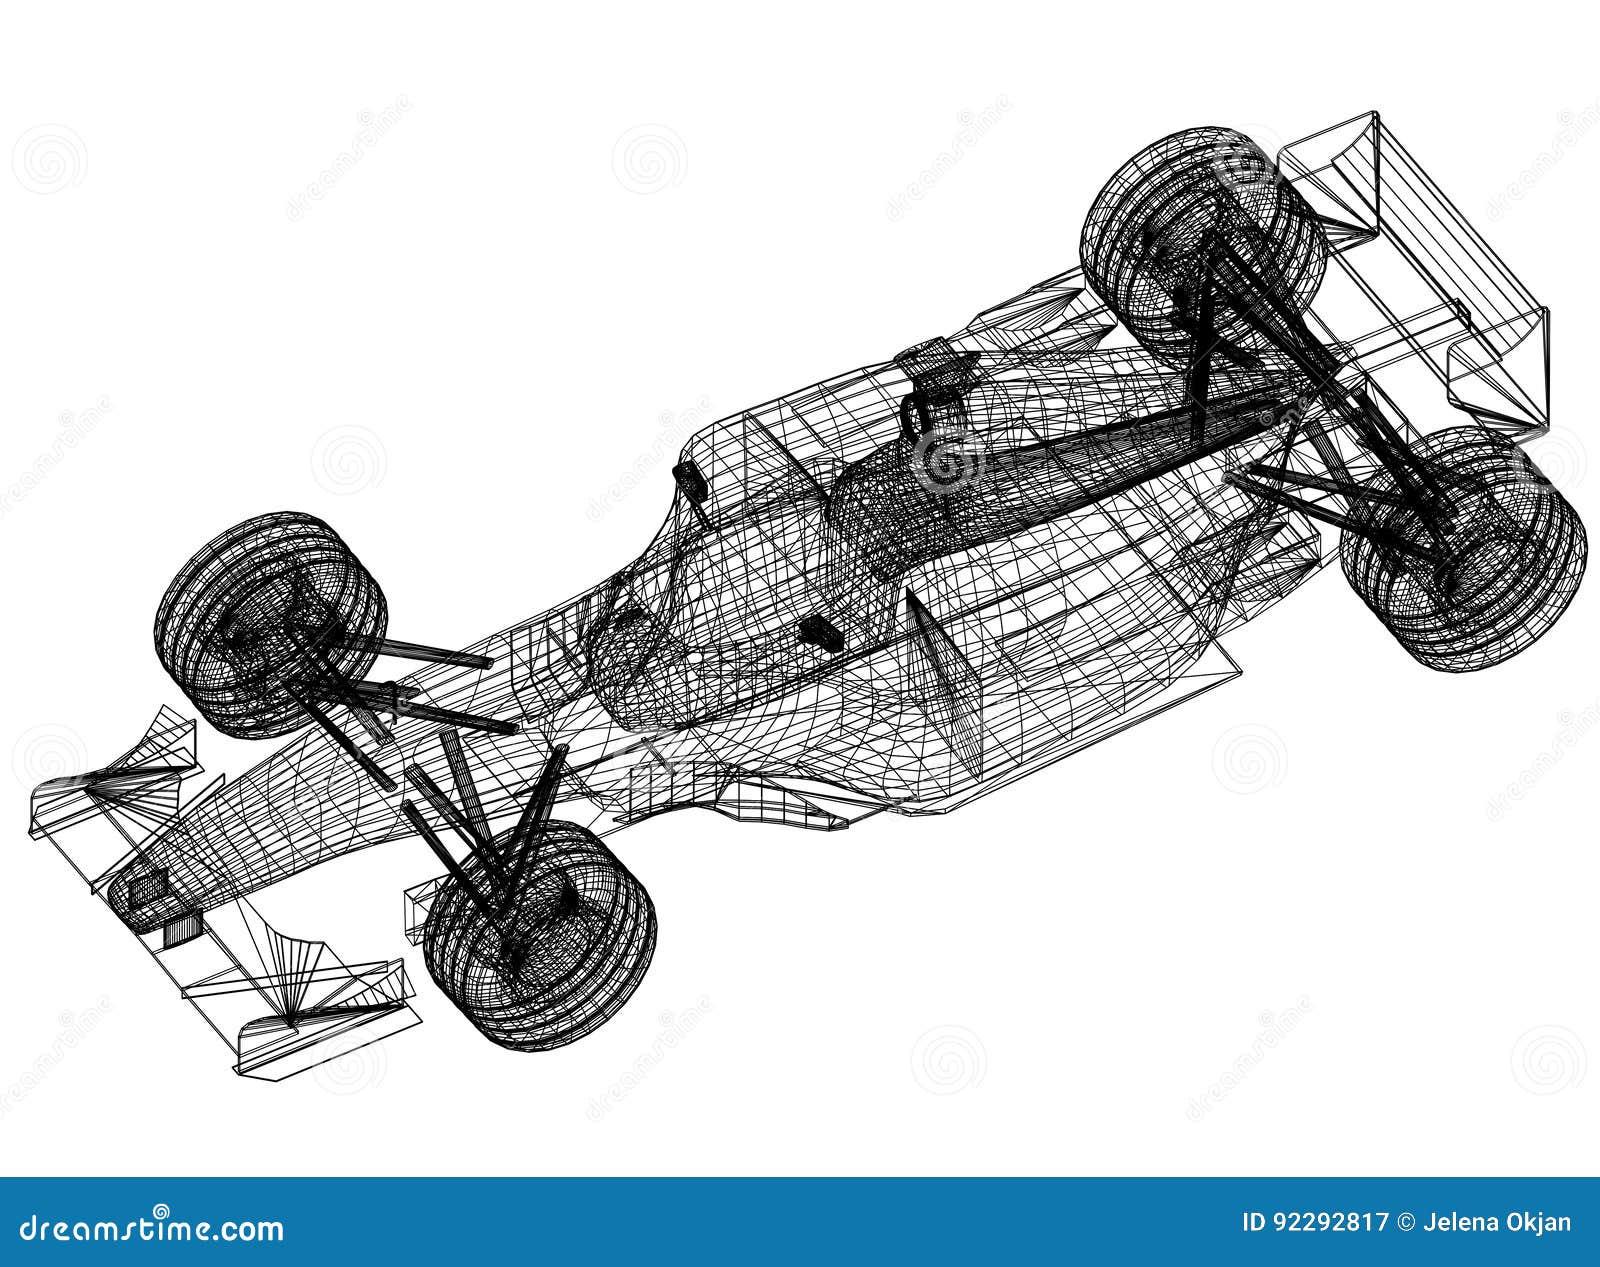 Sport race car blueprint 3d perspective stock illustration download sport race car blueprint 3d perspective stock illustration illustration of blueprint design malvernweather Choice Image